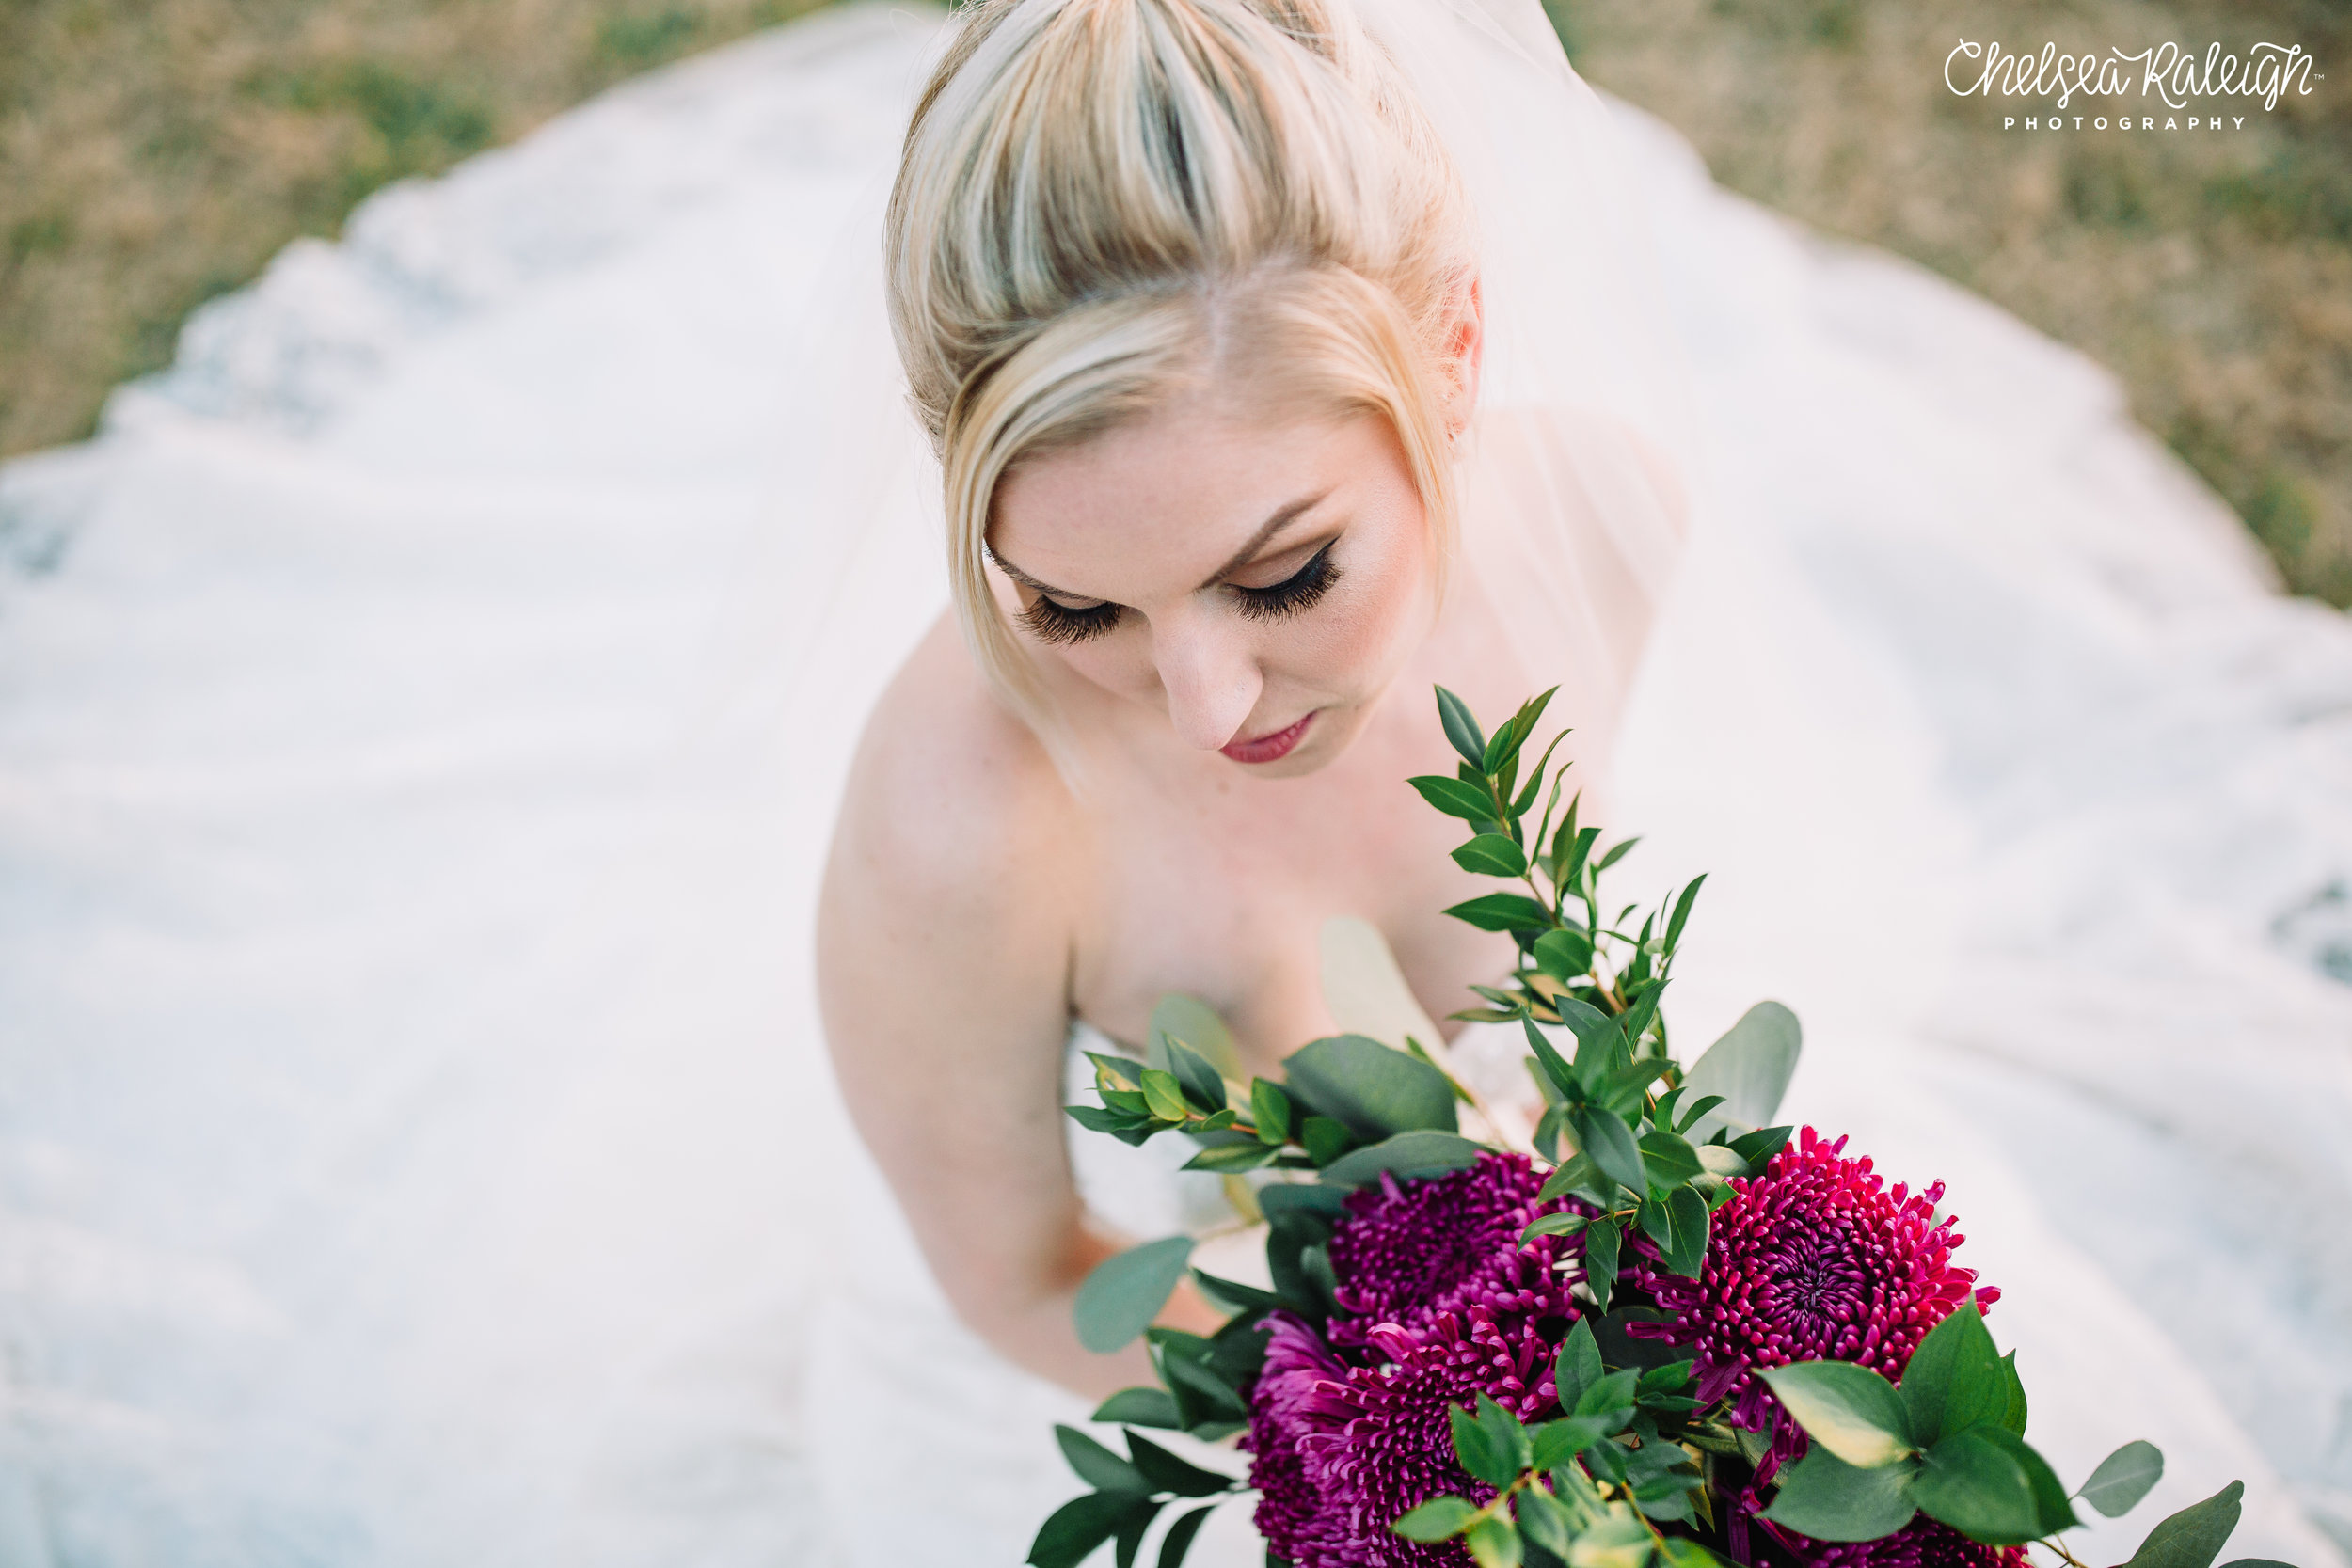 chelsea raleigh photography, dallas photographer, wedding photographer, bridal portraits, dallas brides, texas brides